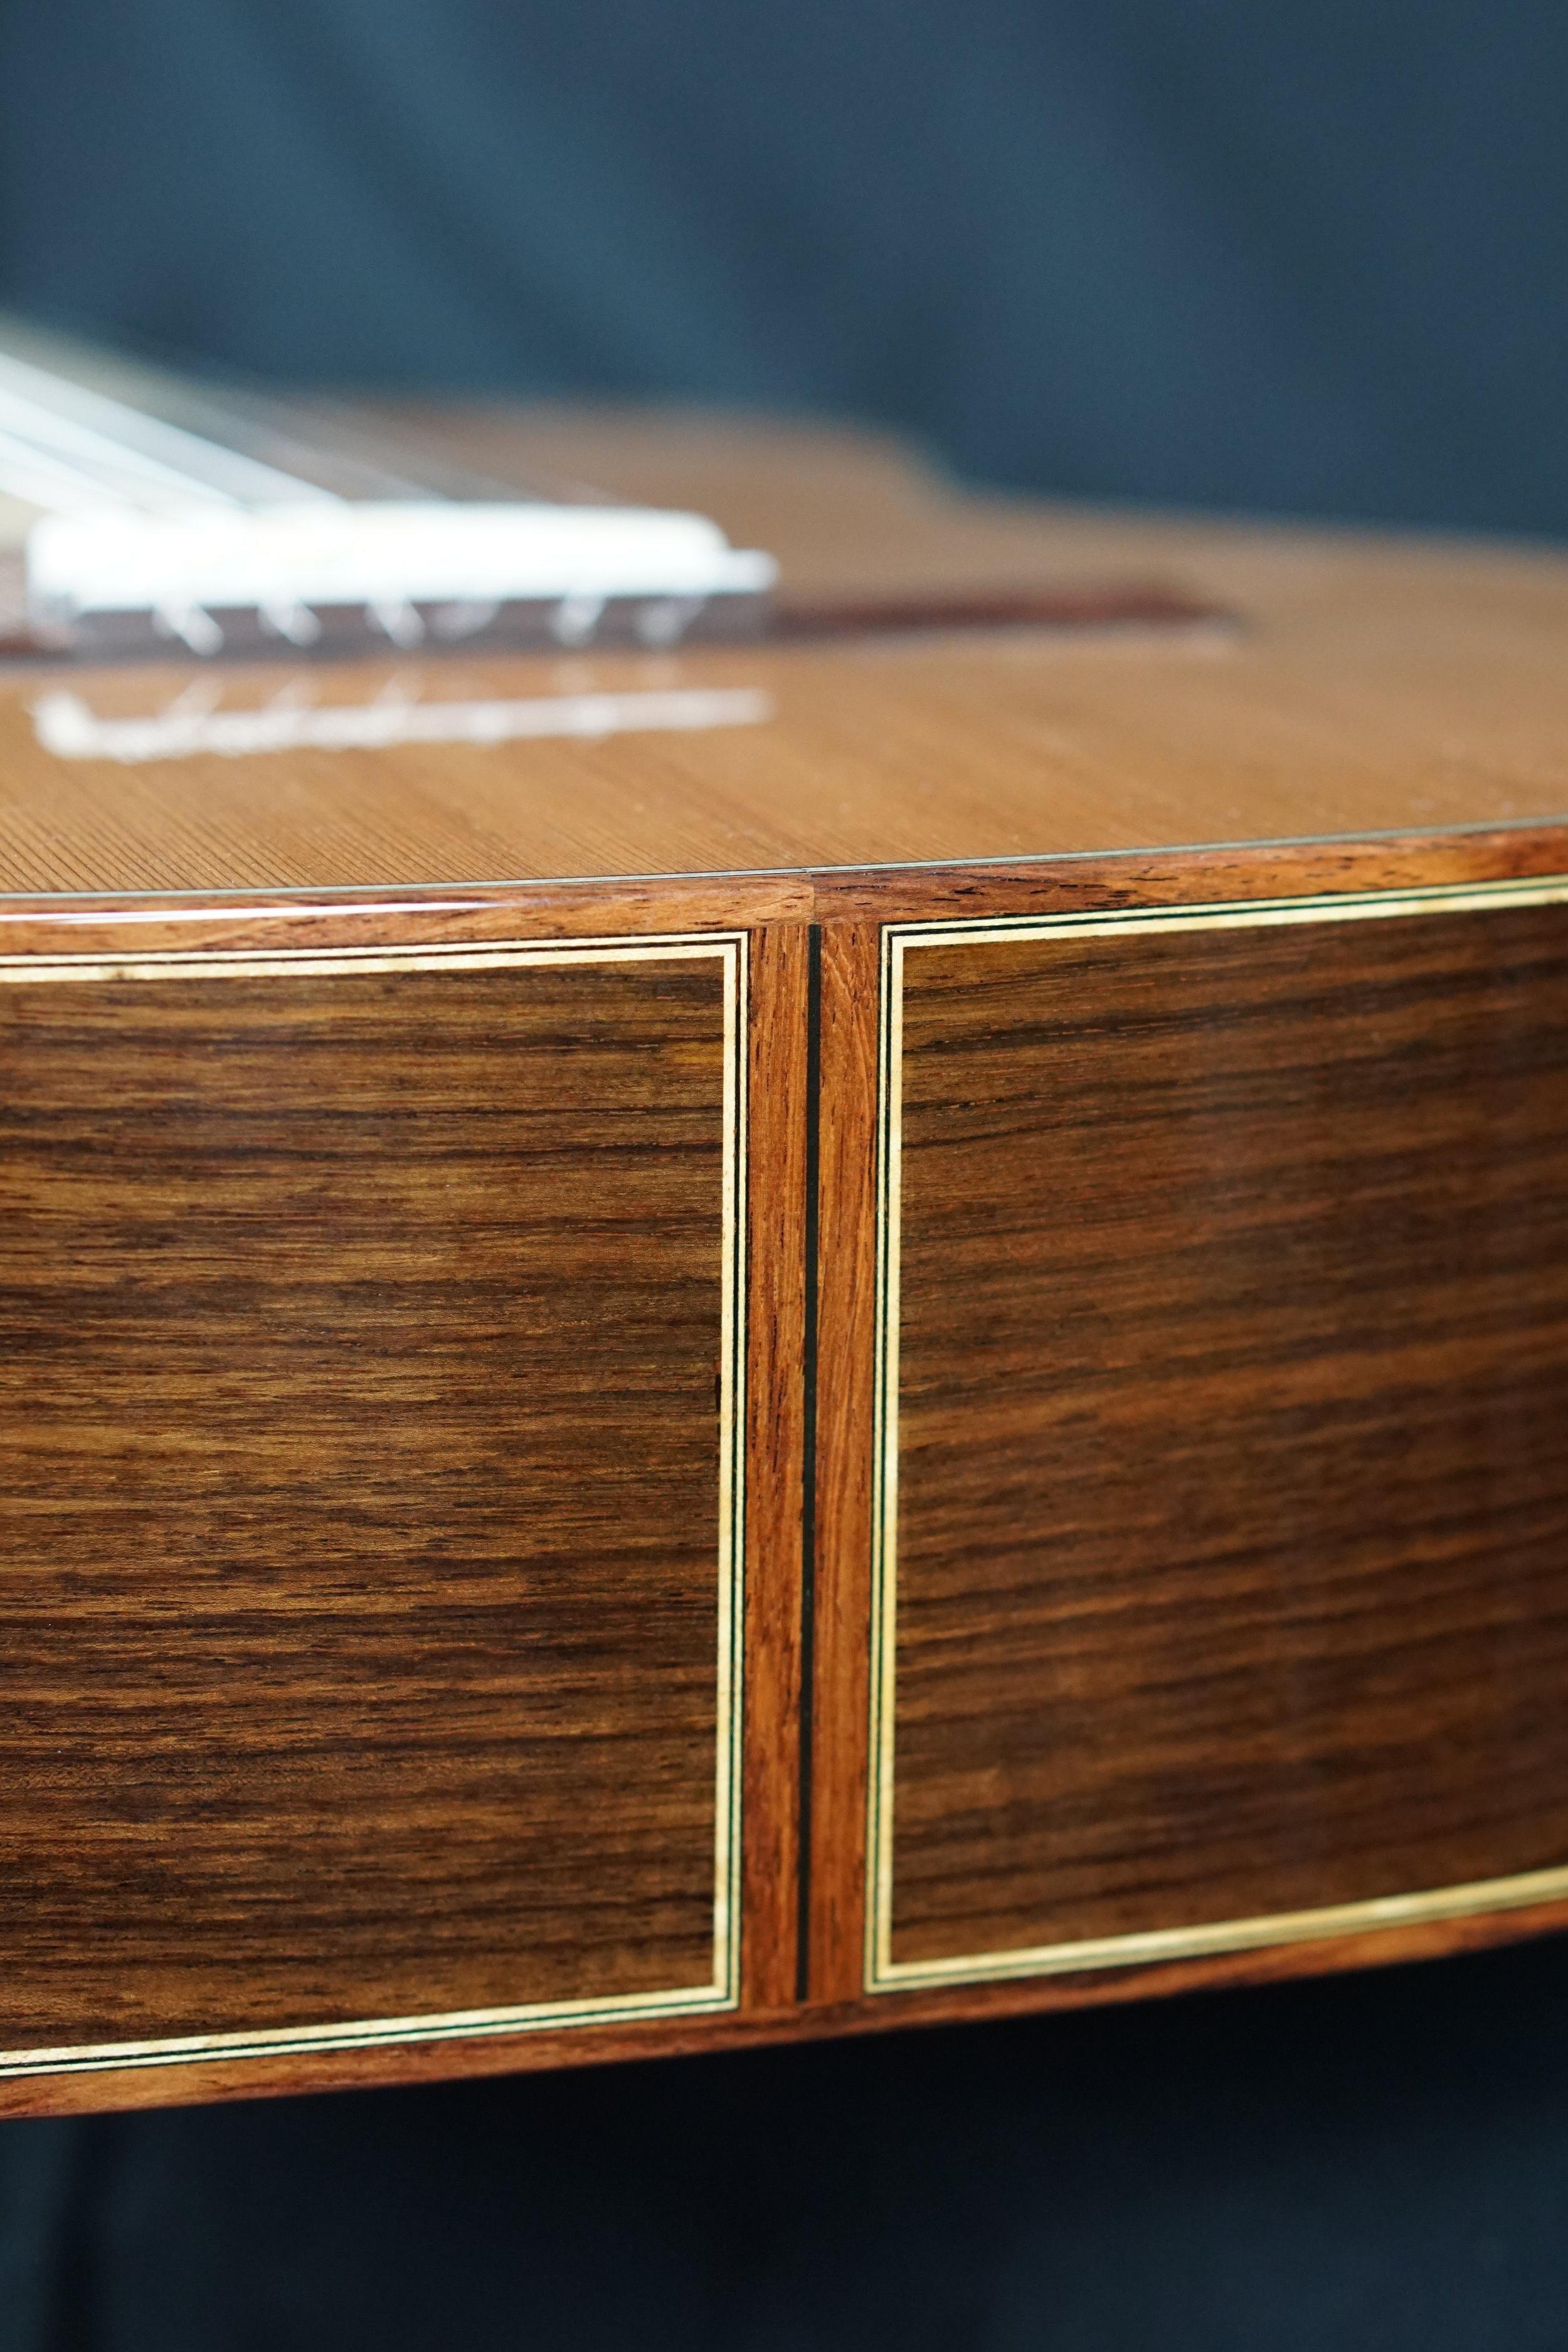 Honduran rosewood end graft detail